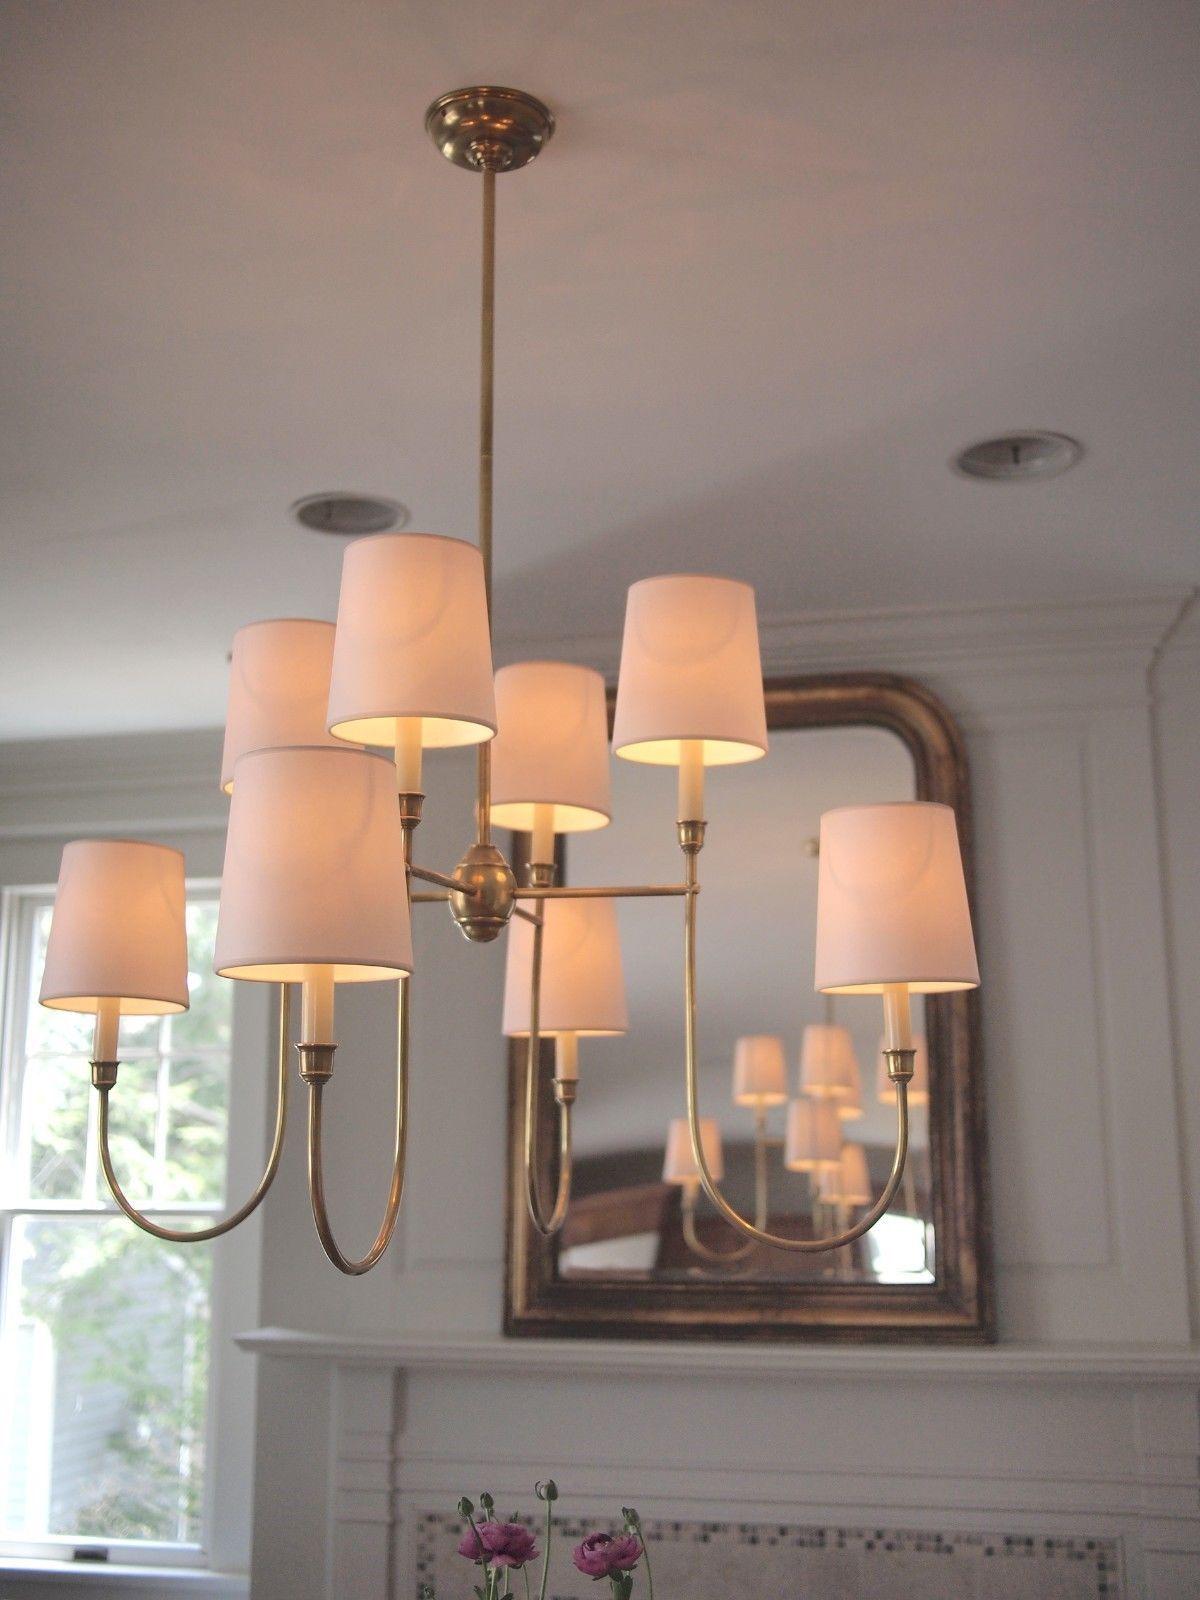 Circa lighting visual comfort vendome chandelier antique brass circa lighting visual comfort vendome chandelier antique brass ebay aloadofball Choice Image